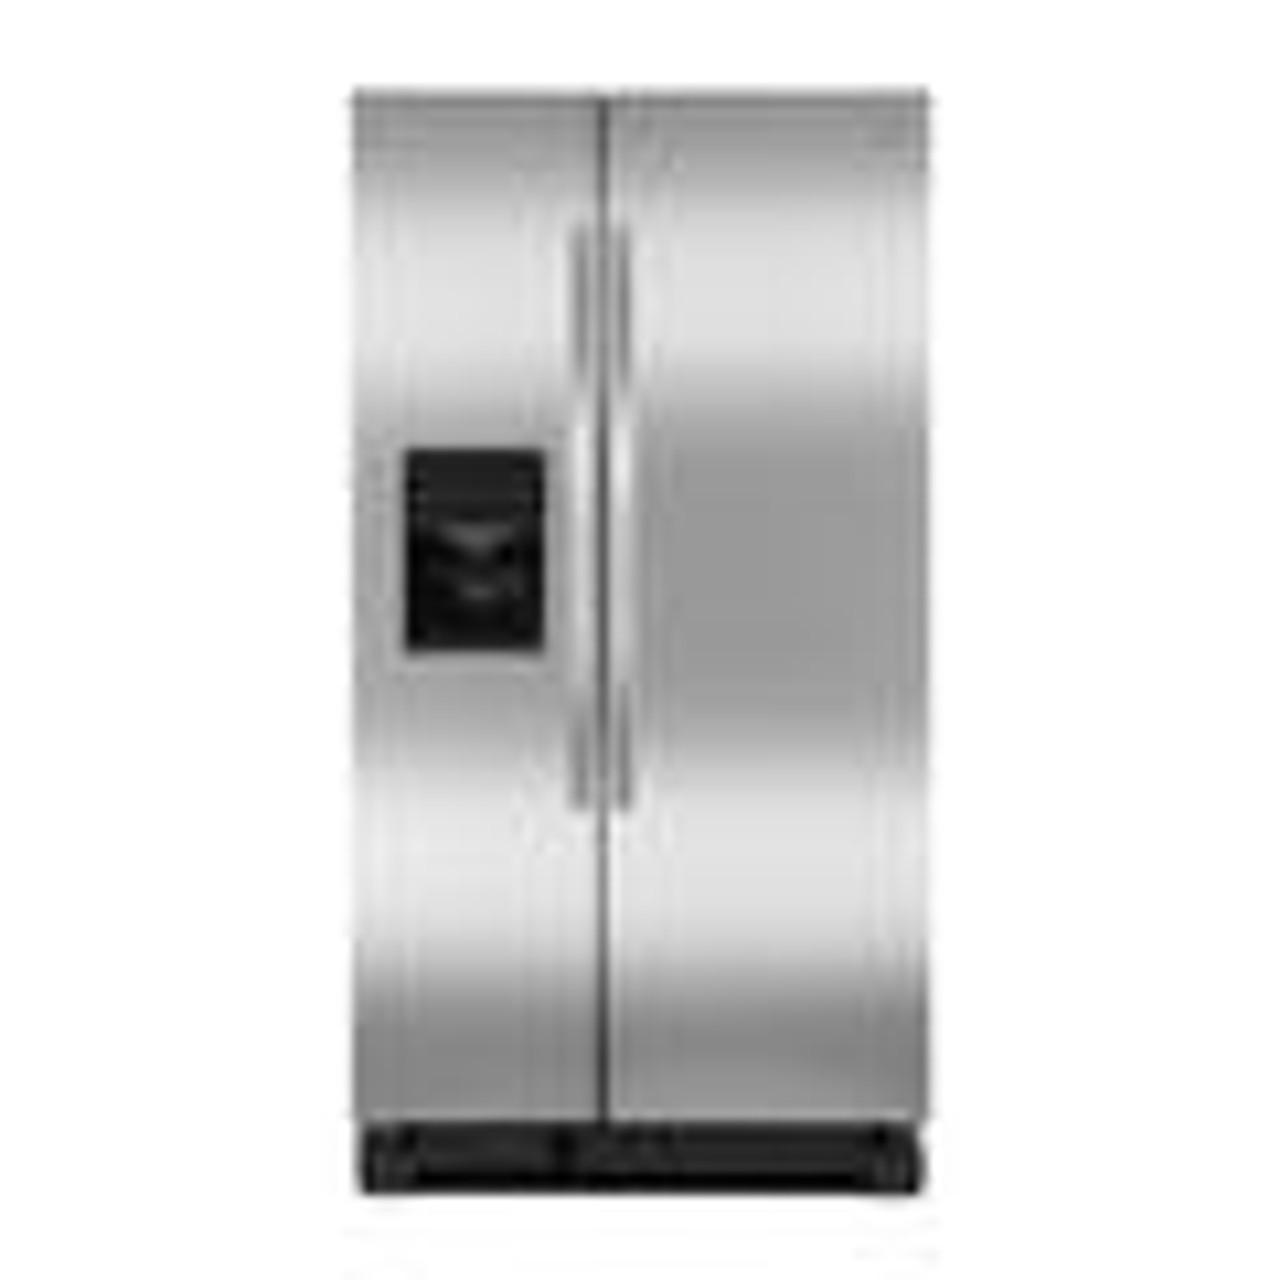 Refrigerator Parts & Accessories